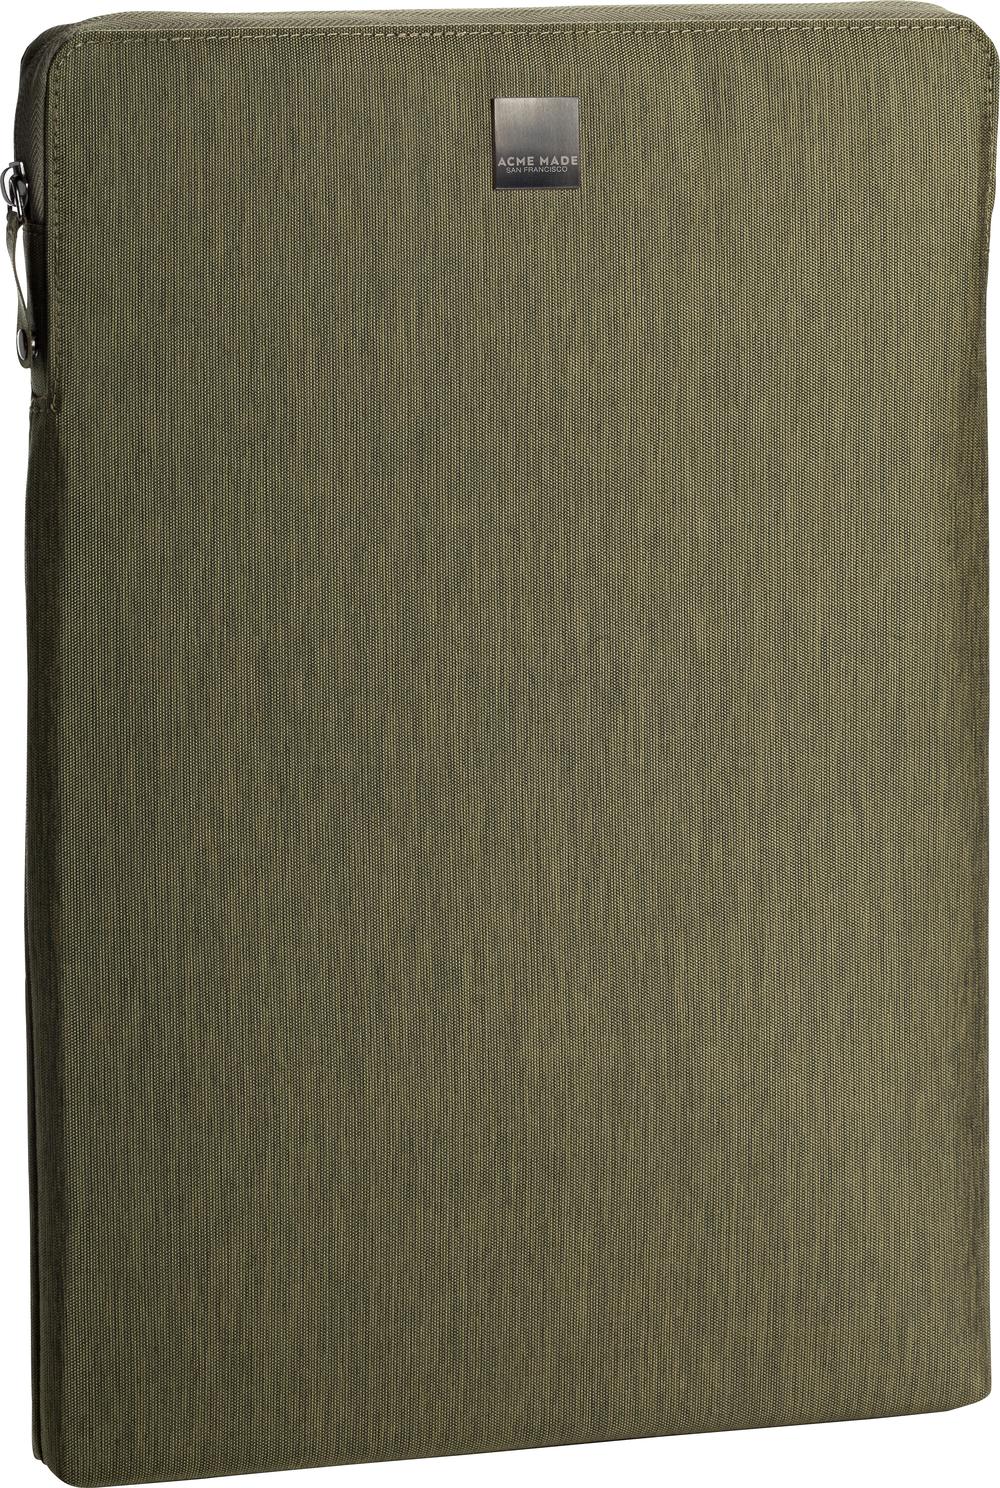 Acme Made Montgomery Street Sleeve MacBook Pro Olive Green